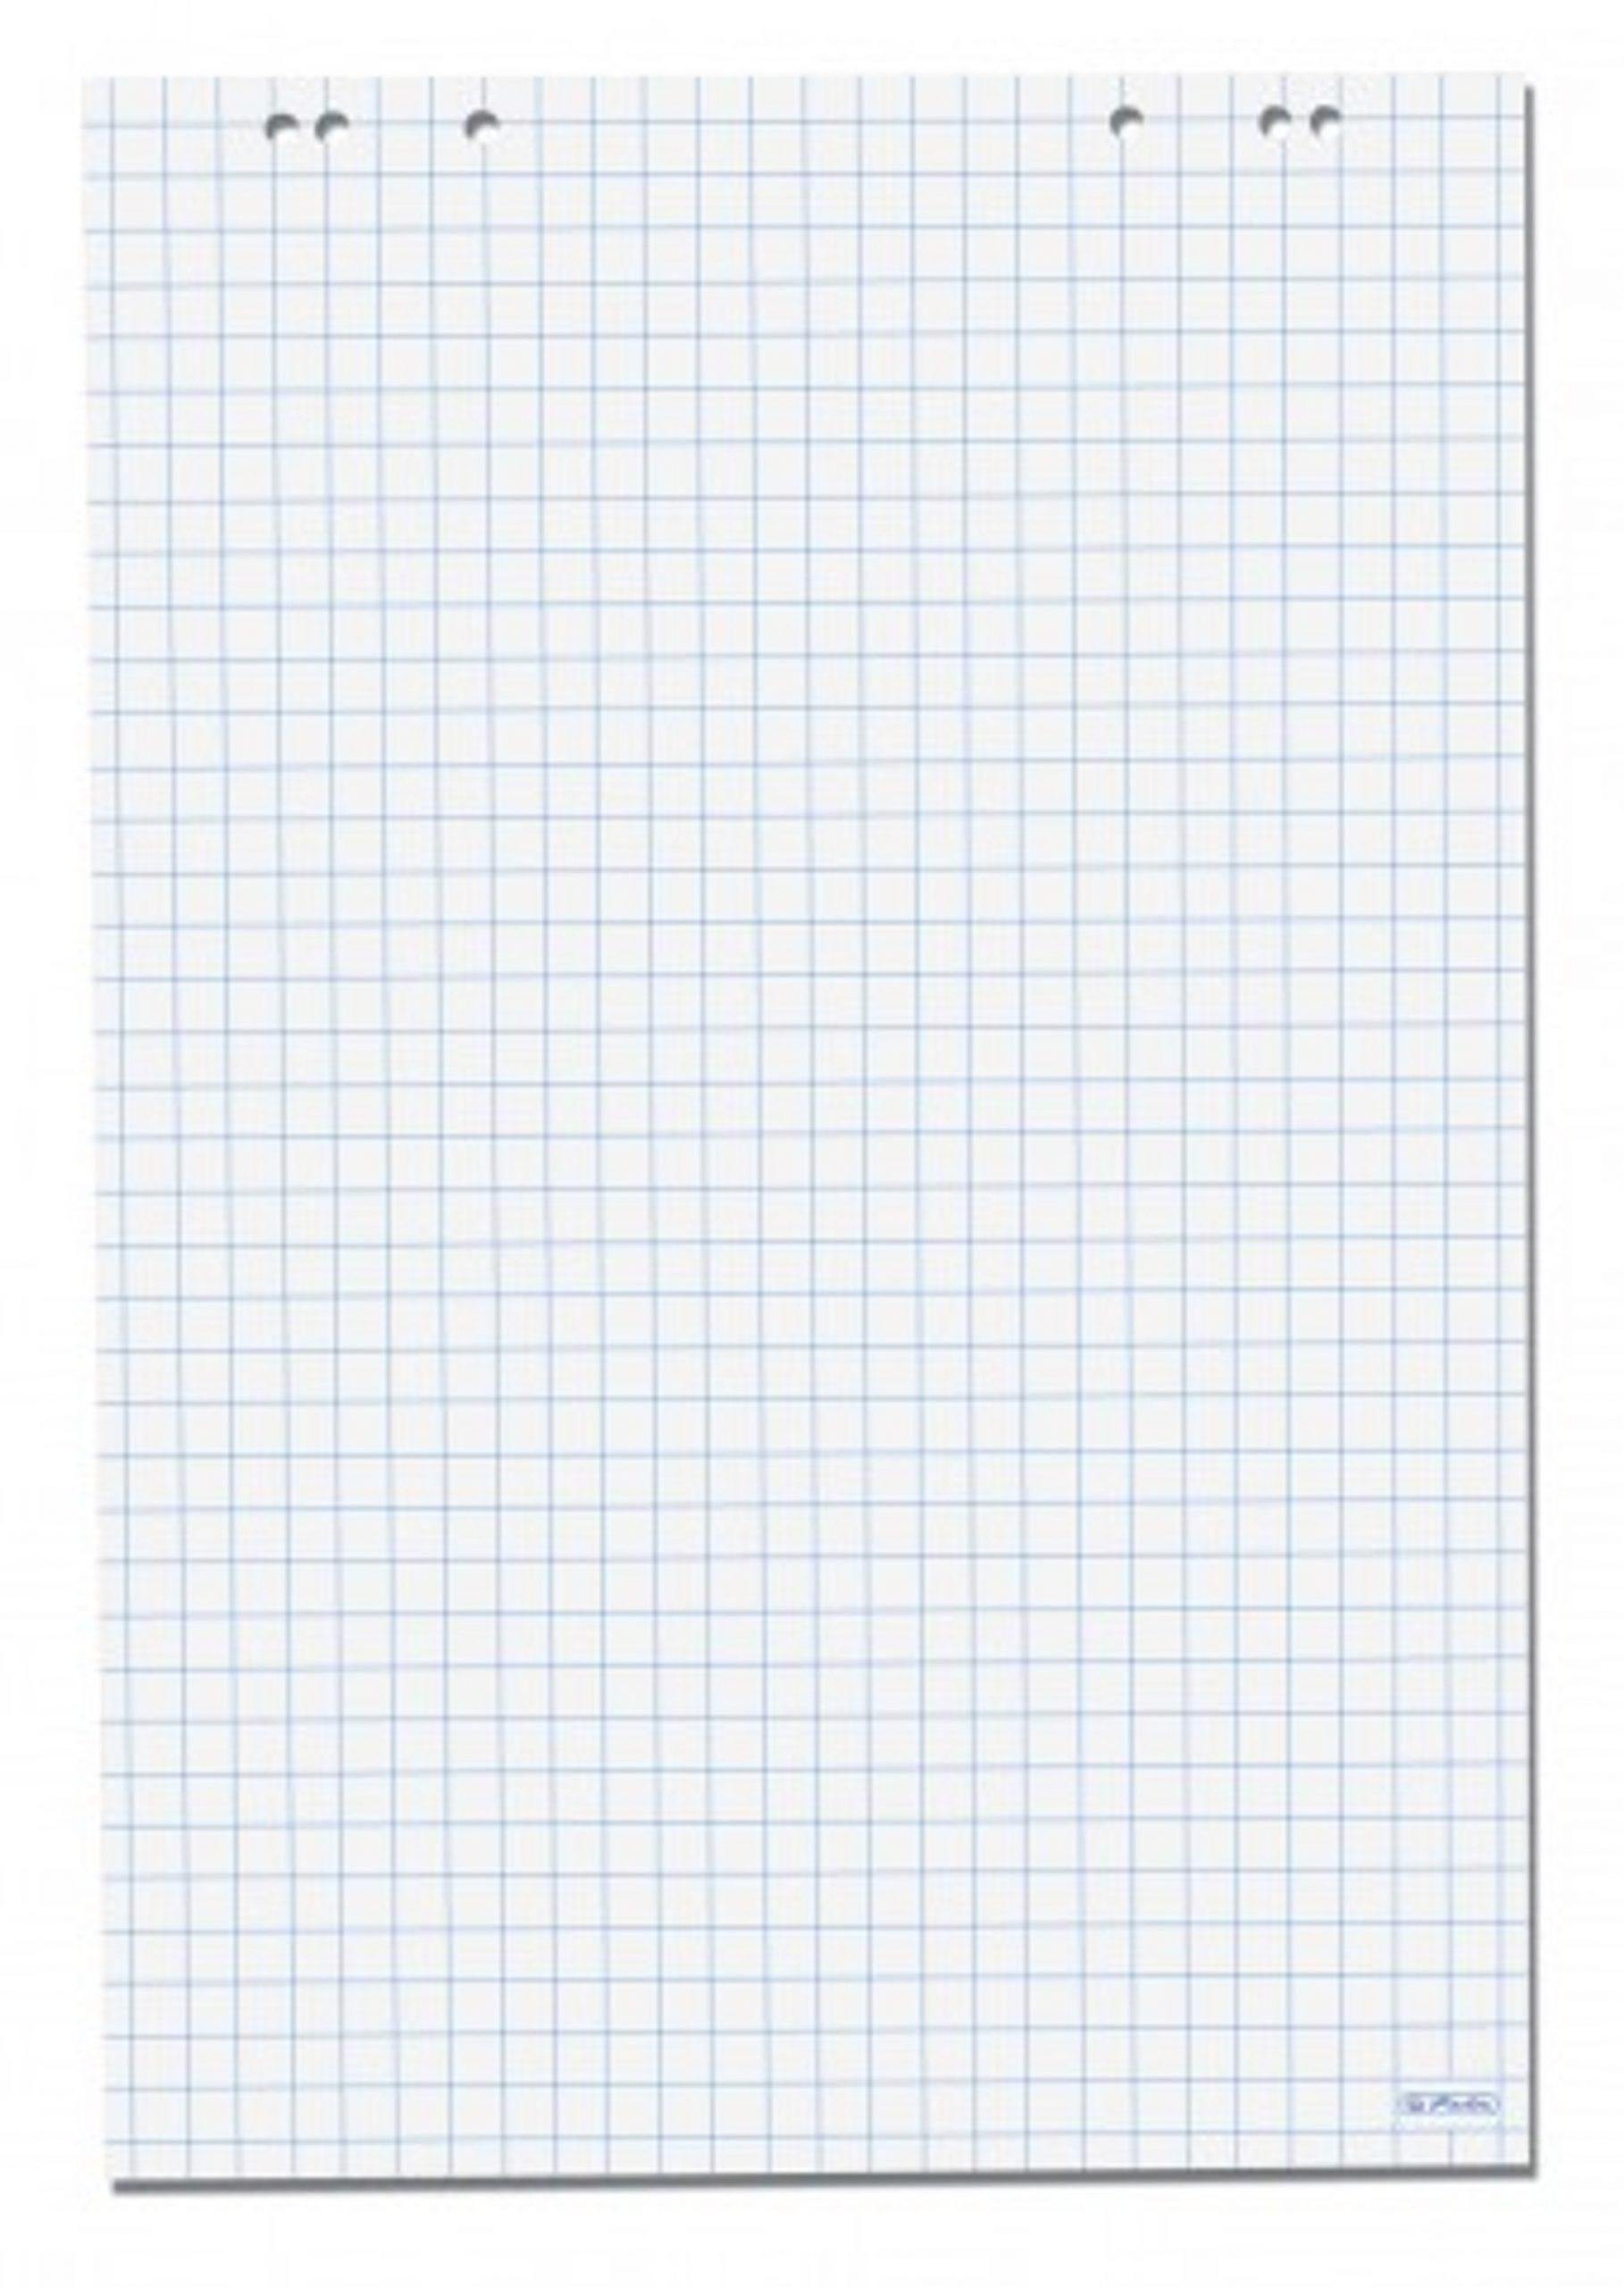 Kariertes Blatt A4 Ausdrucken | Kariertes Blatt Papier mit Karo Blatt